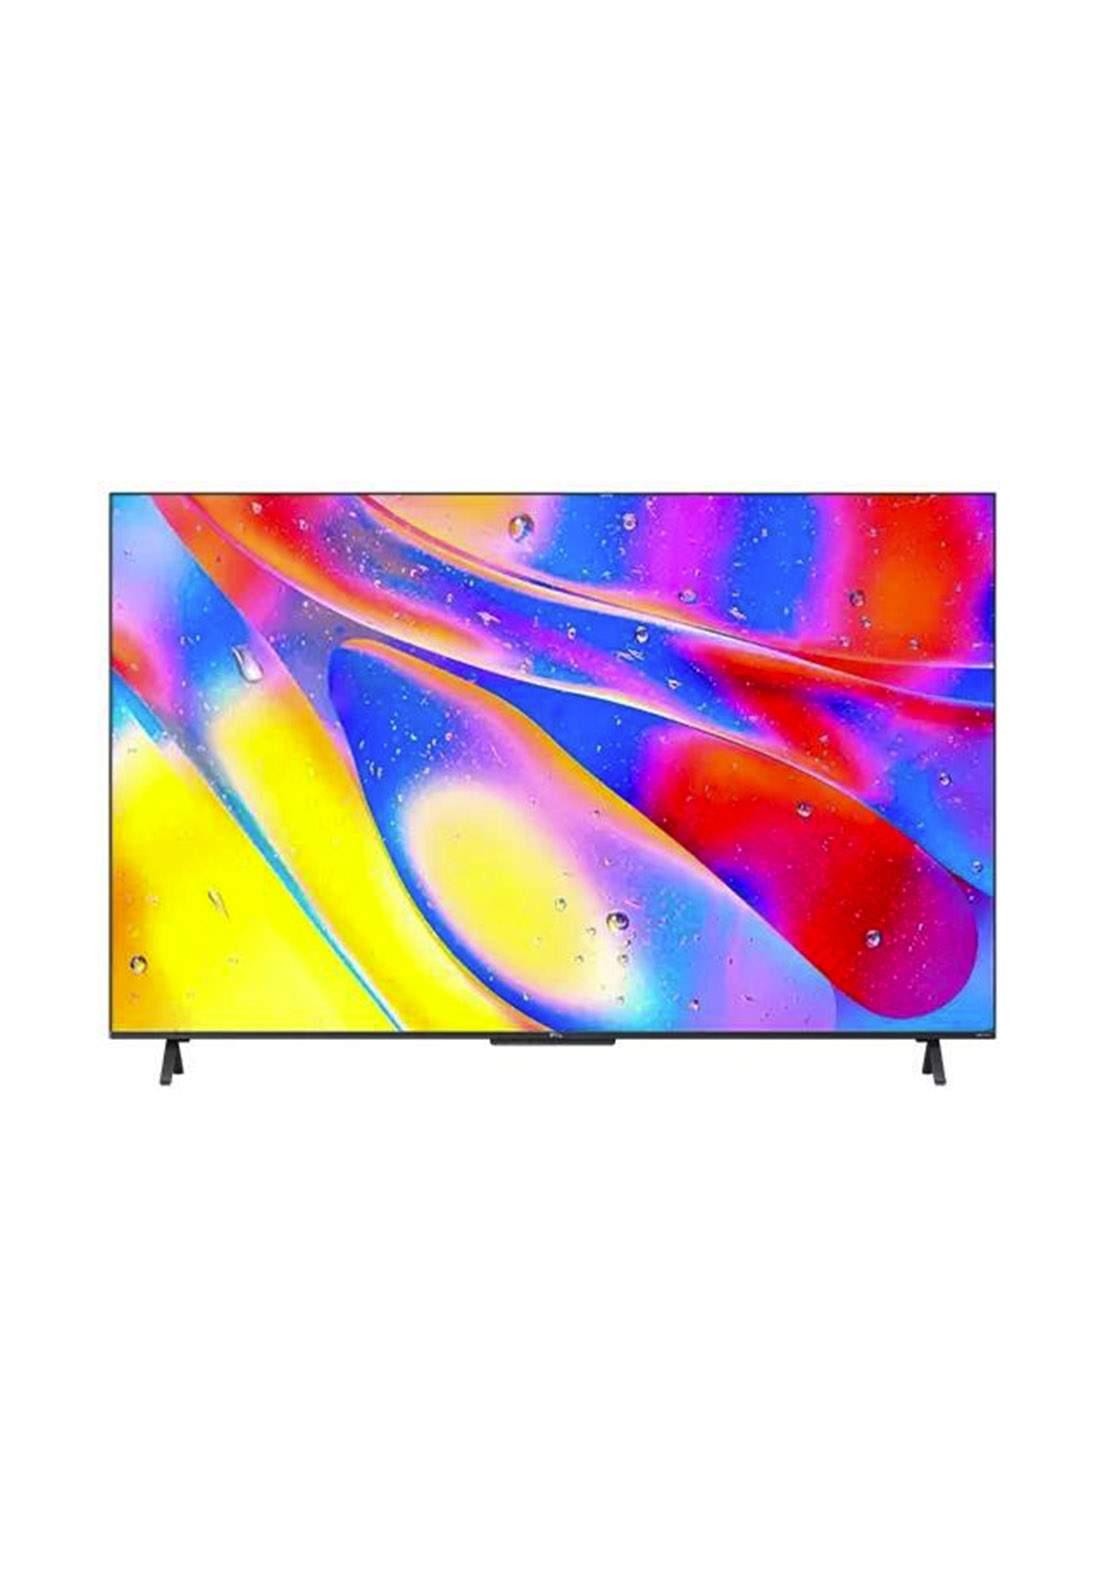 TCL 50C725 50-inch Ultra HD 4K Smart QLED TV-  Black شاشة ذكية